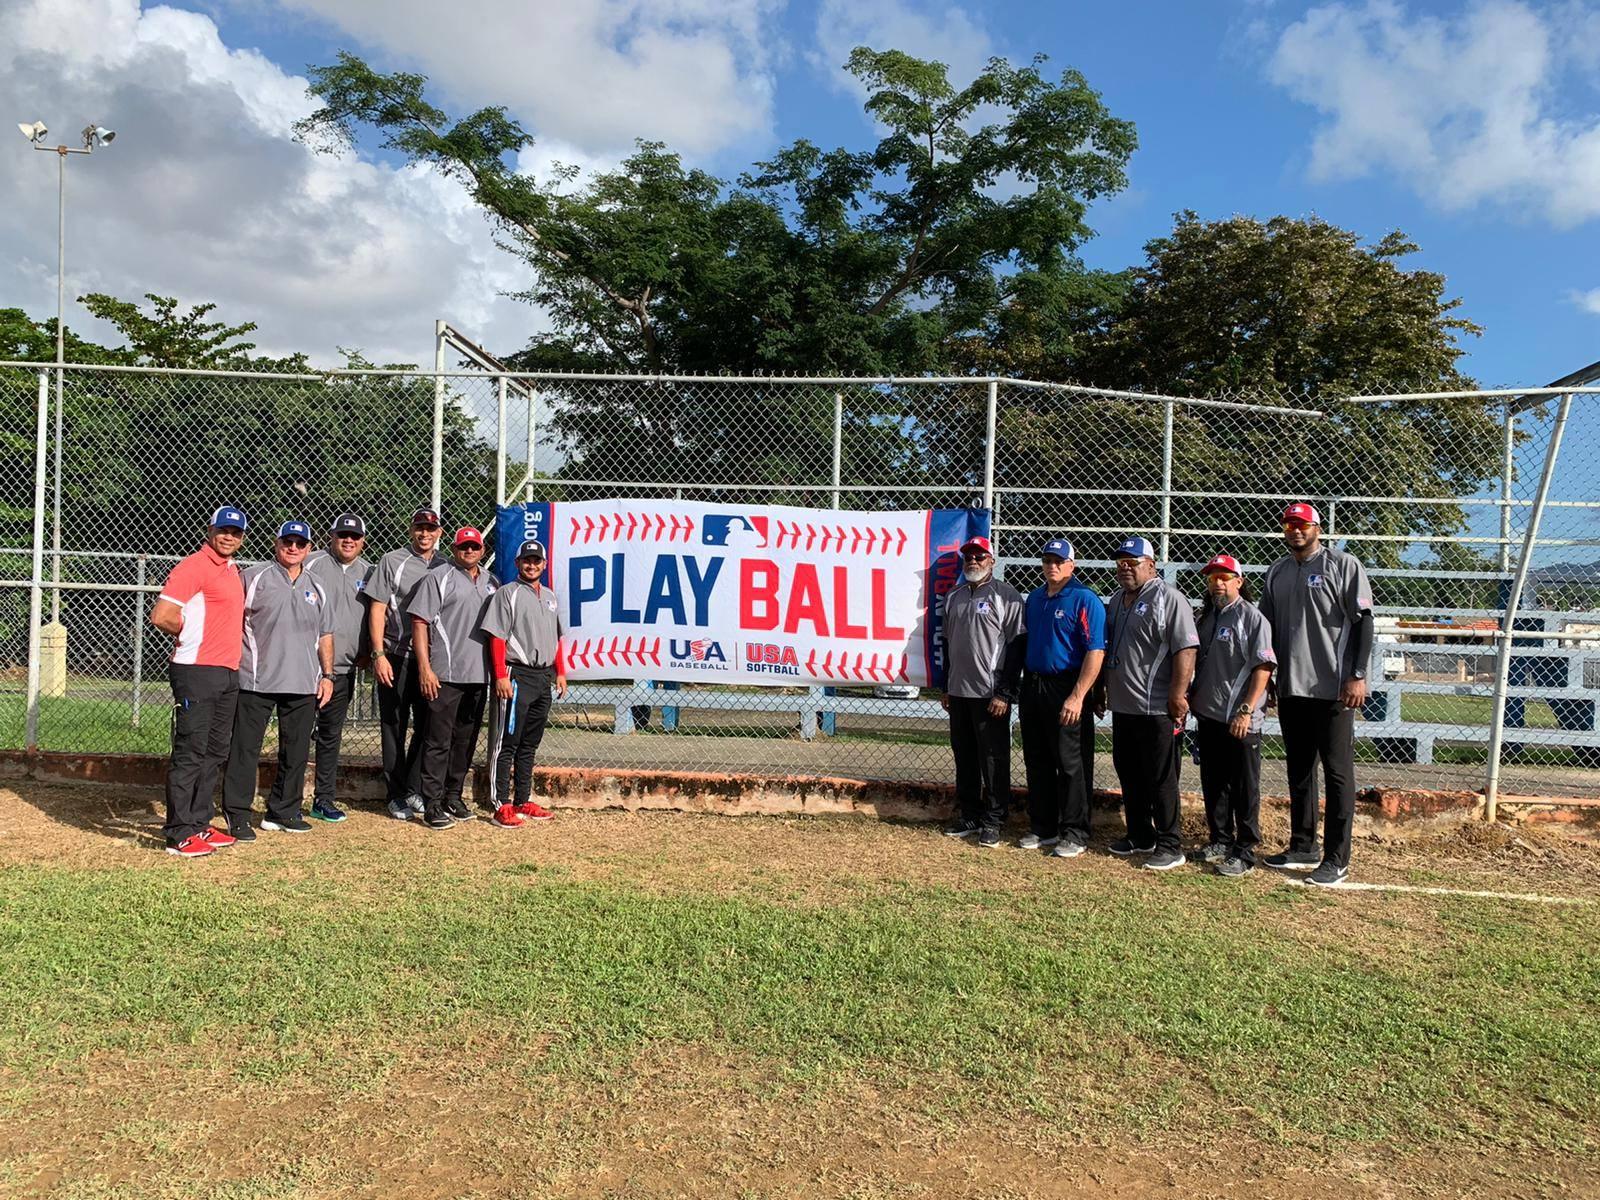 Clinicas Especializadas para Atletas de Baseball